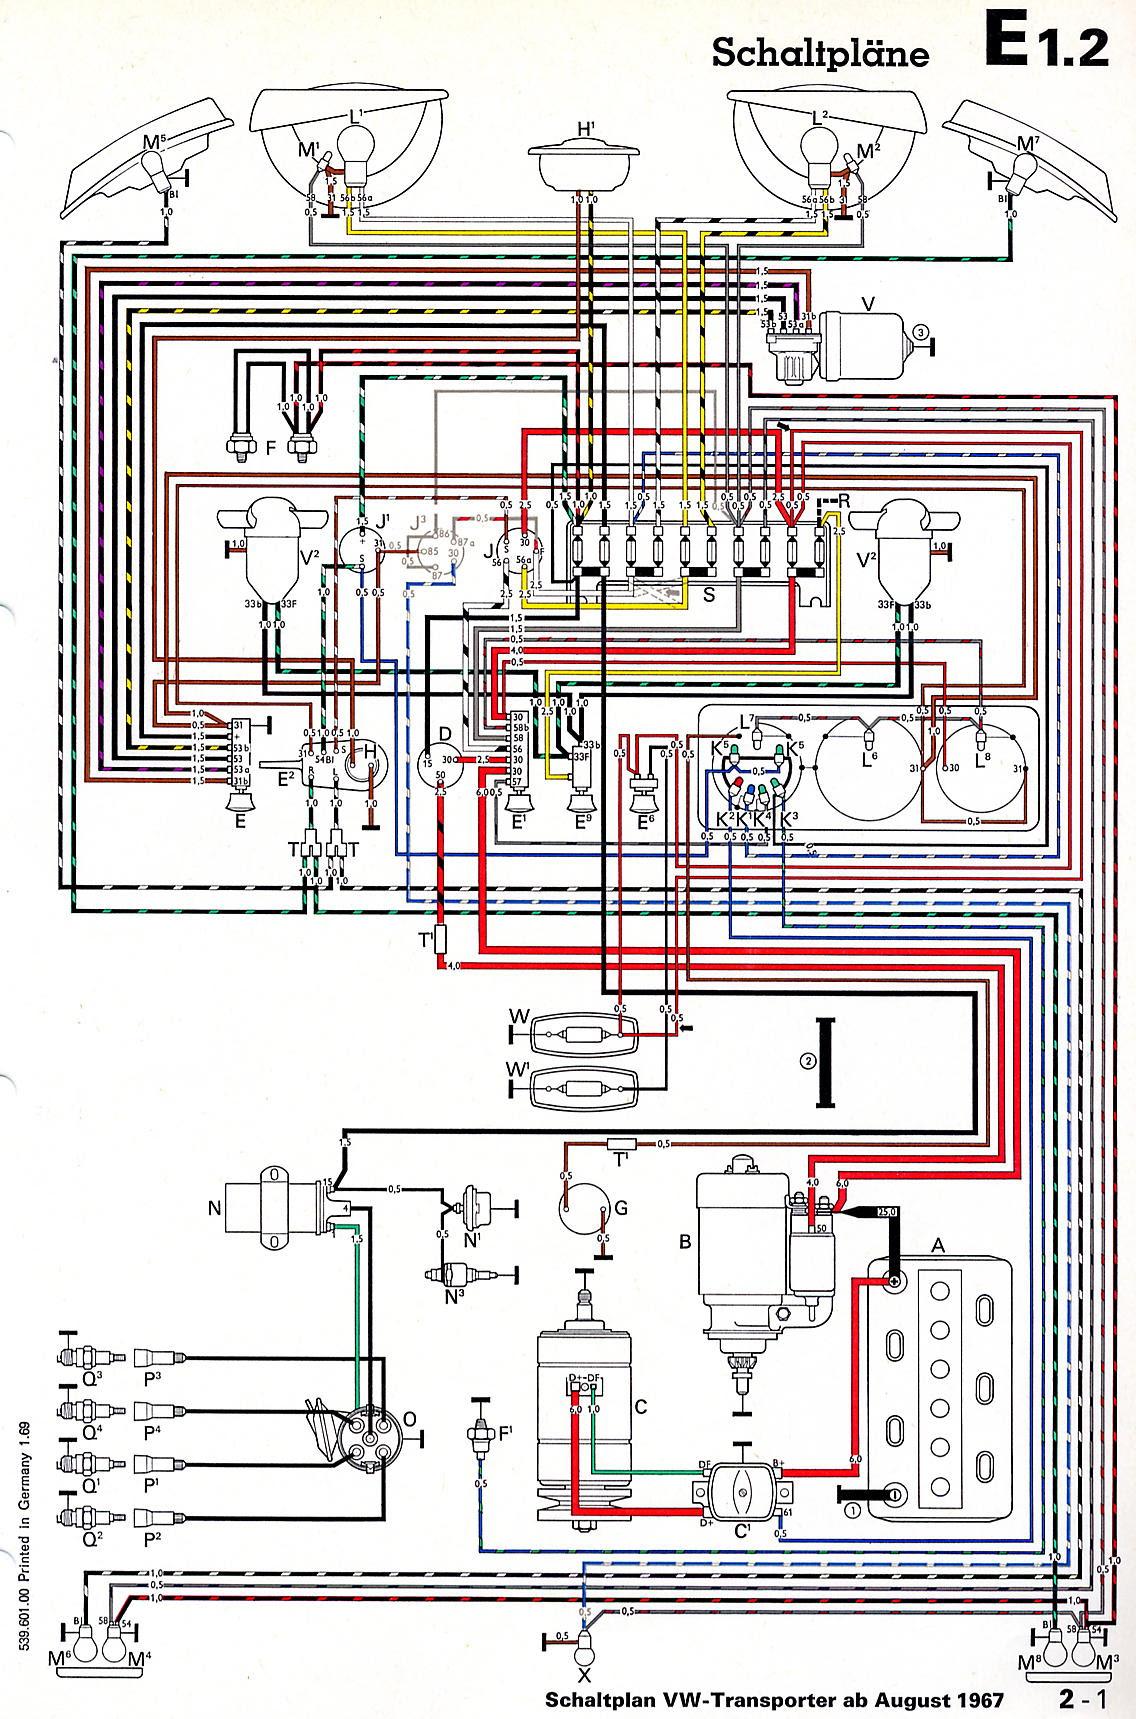 Diagram Vw Tiguan Wiring Diagram Full Version Hd Quality Wiring Diagram Csiwiring Villaroveri It